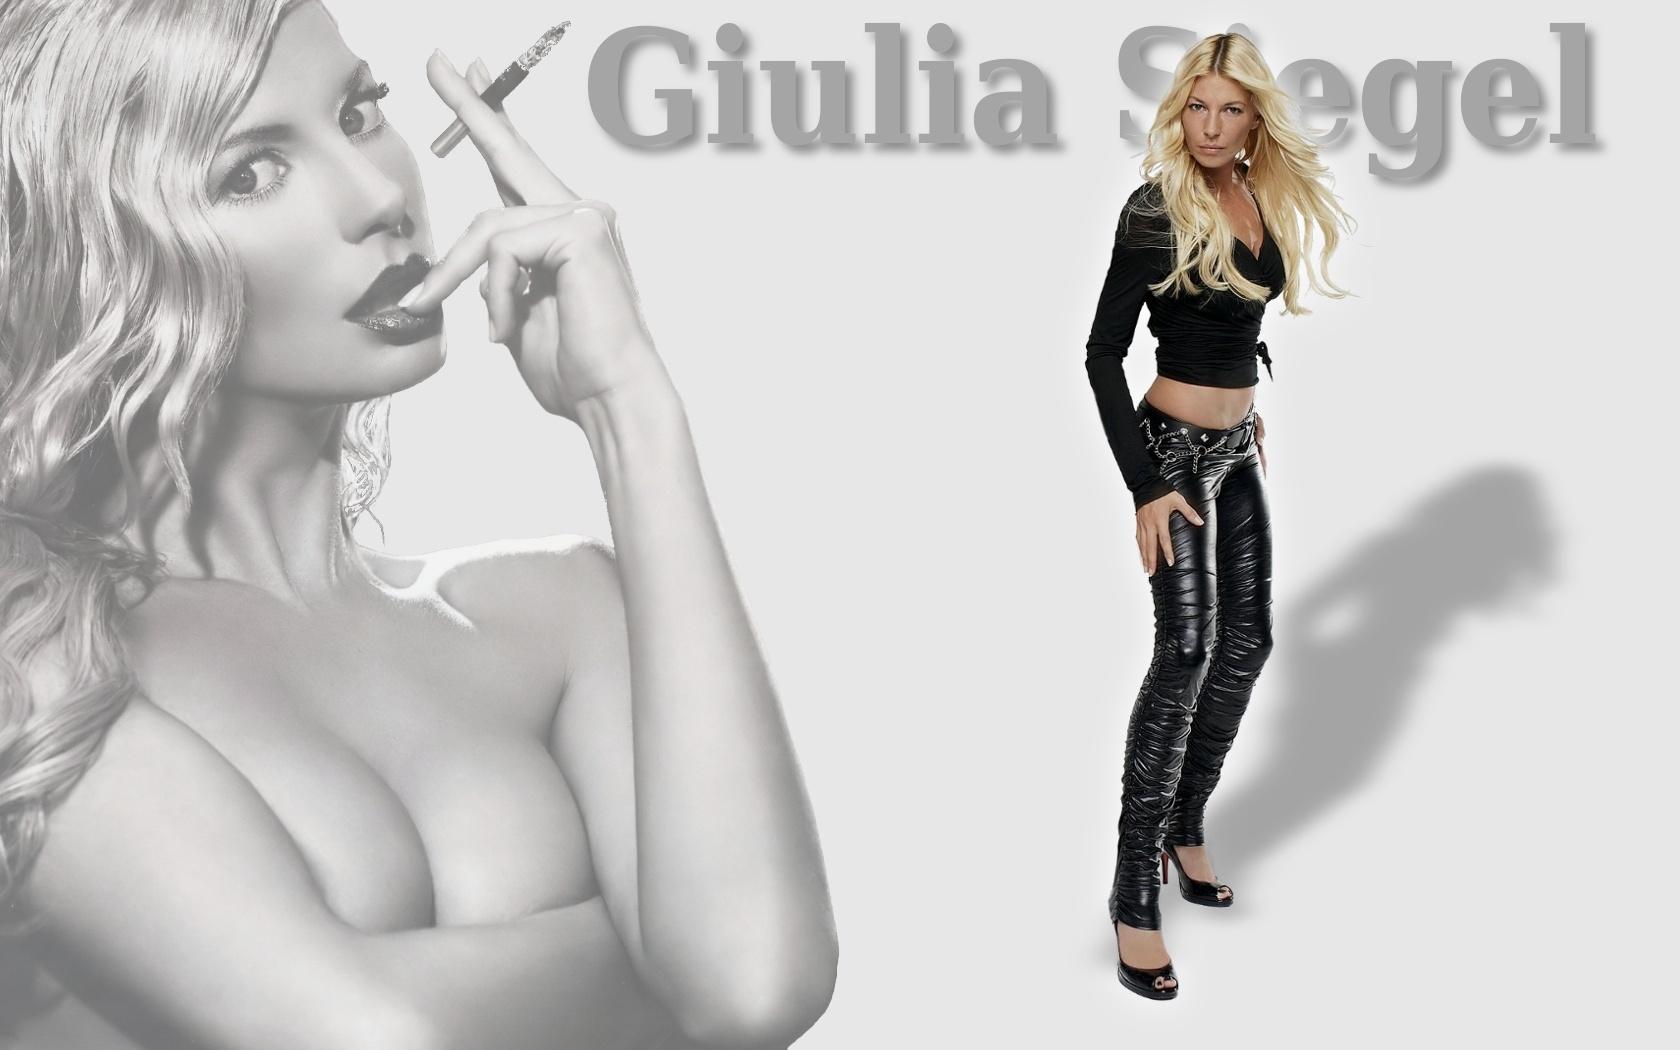 Giulia Siegel - Photo Colection